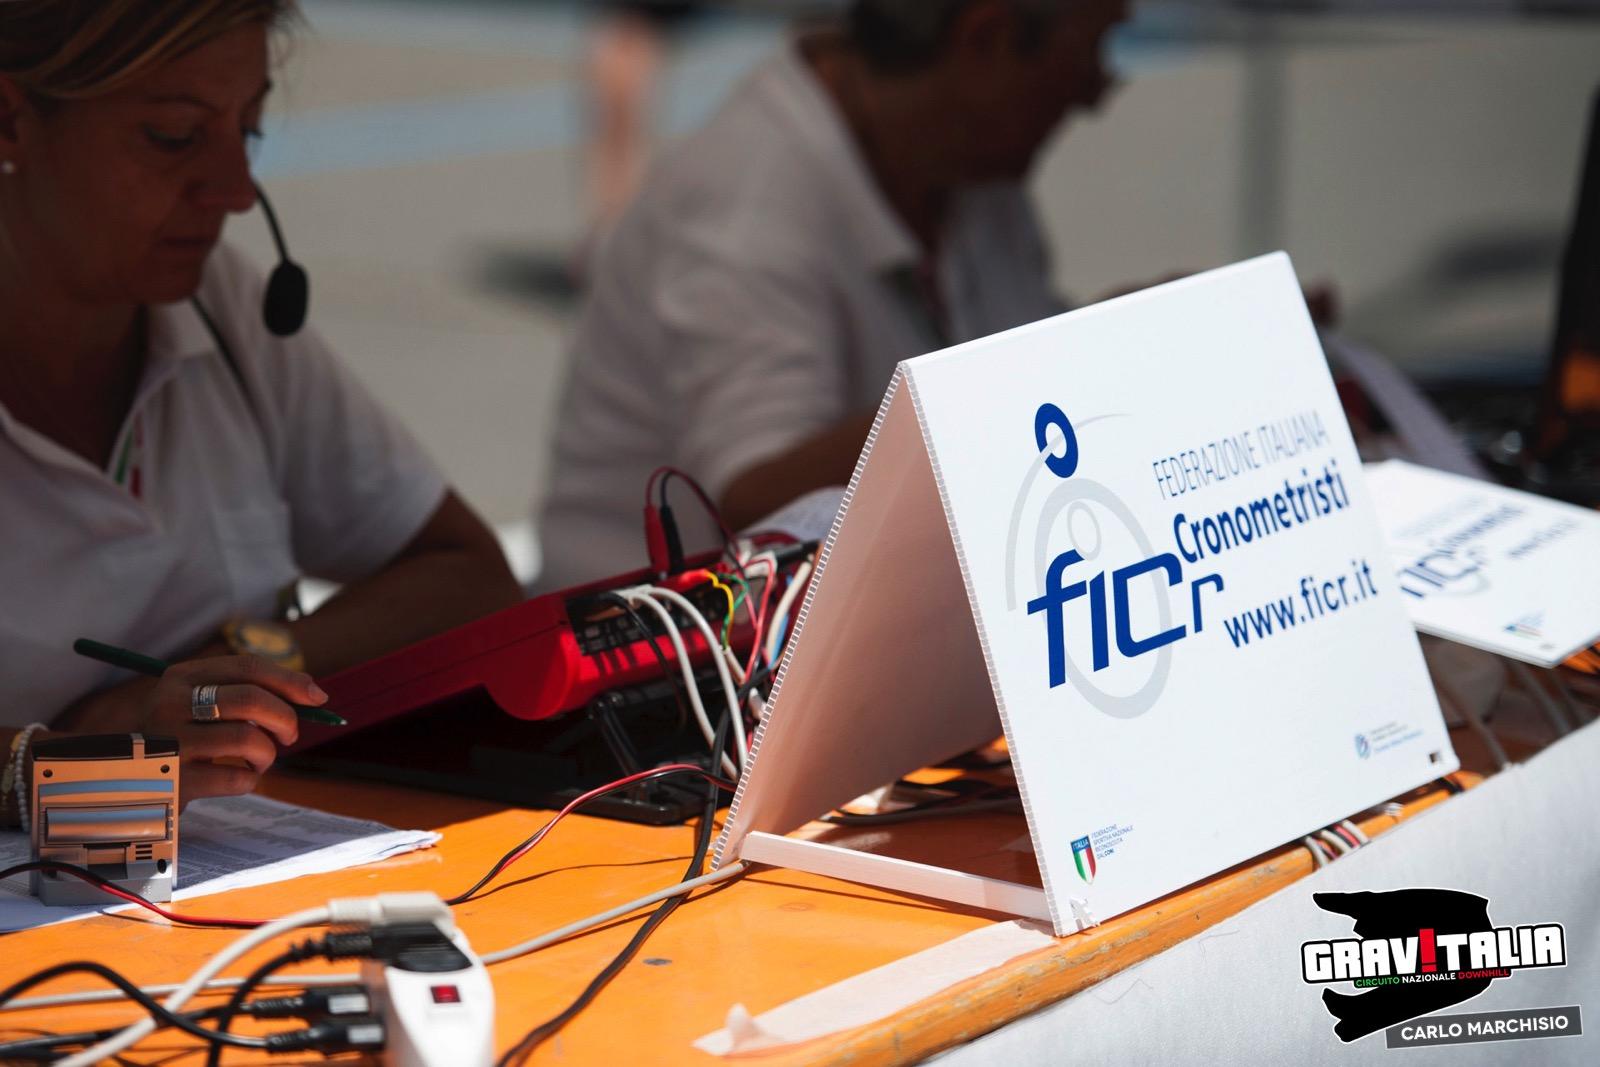 PhotoCarloMarchisio_GIT2015_CampionatiItaliani_Sestola_031